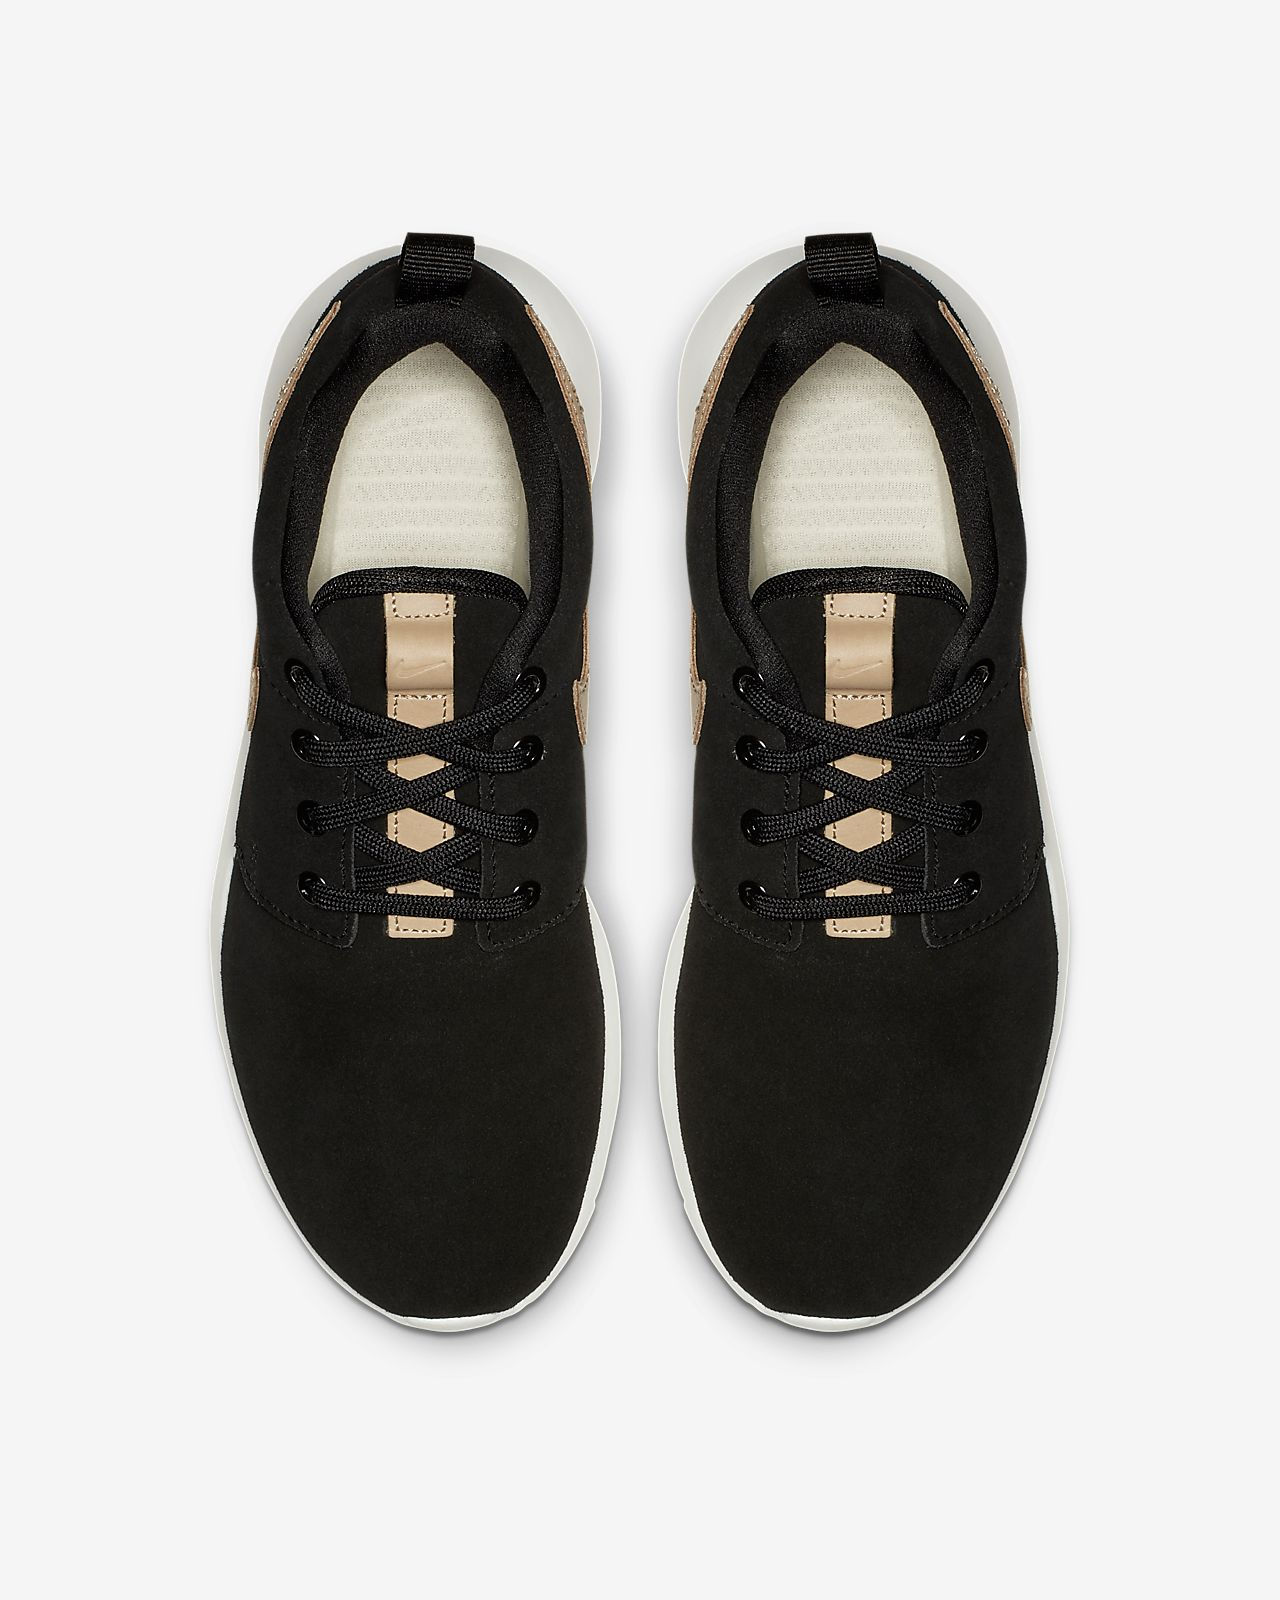 6f1222519510 Nike Roshe One Premium Women s Shoe. Nike.com